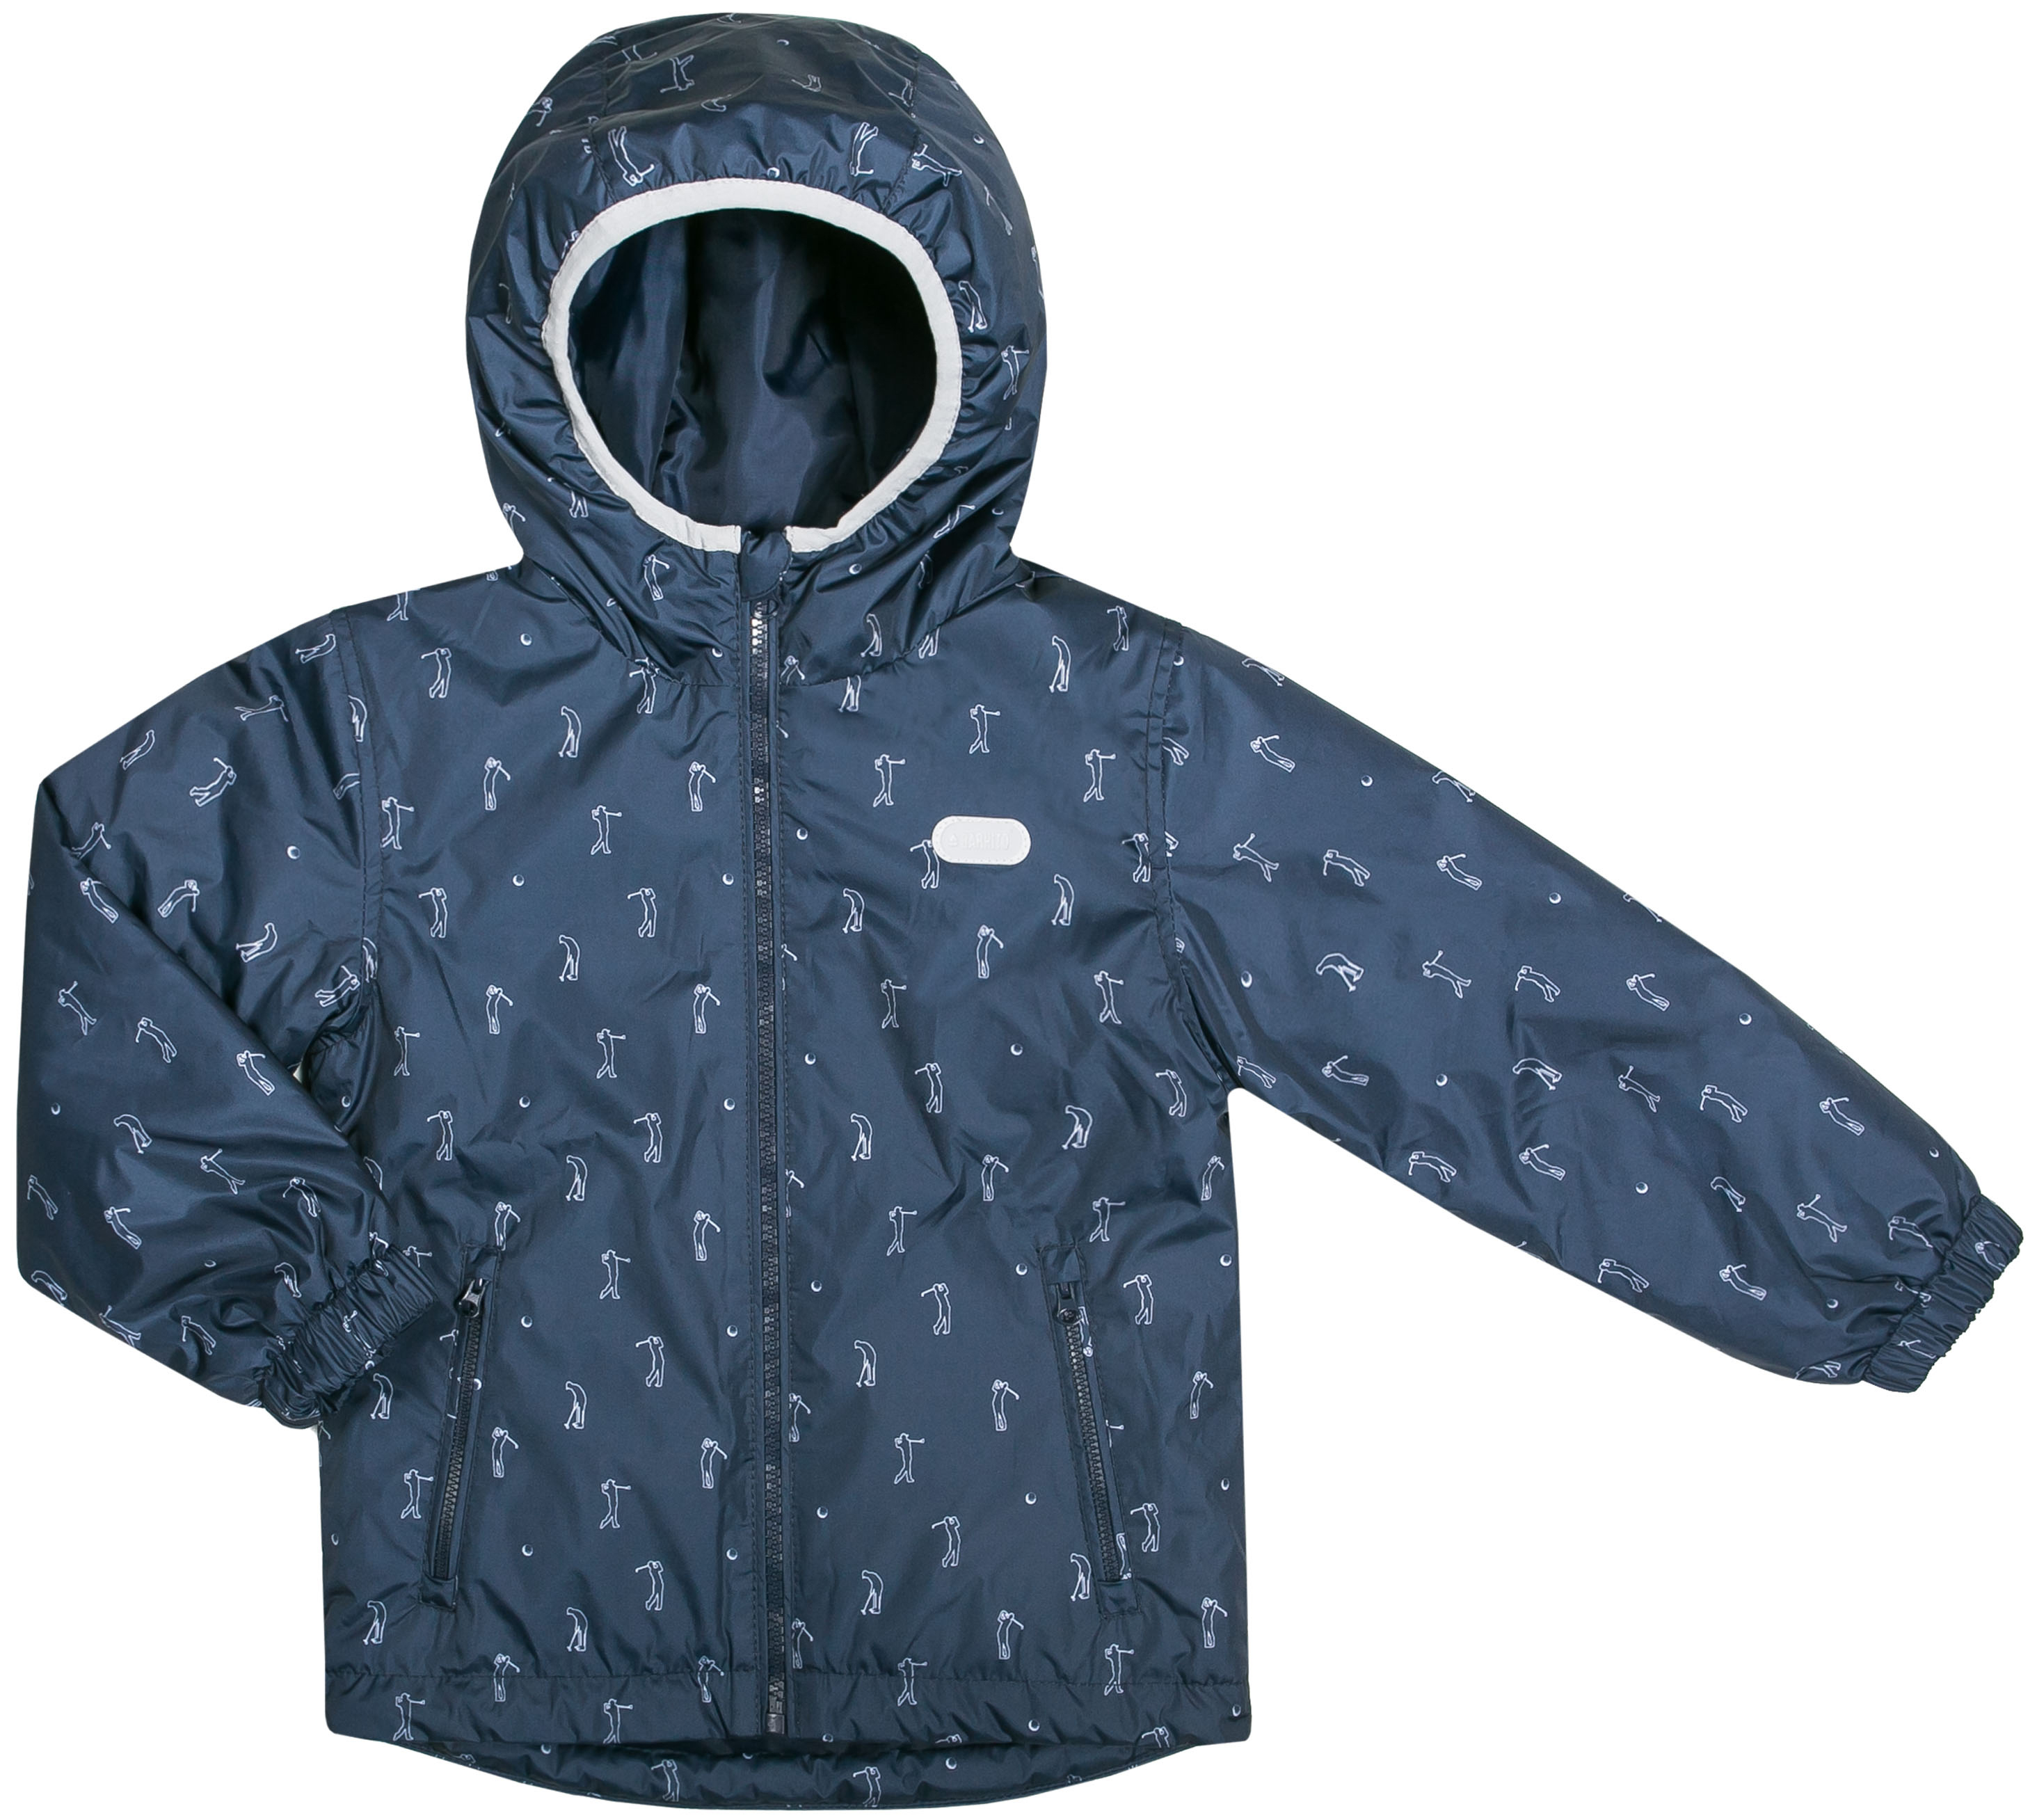 Фото - Куртки Barkito Куртка для мальчика Barkito, темно-синяя с рисунком куртки пальто пуховики coccodrillo куртка для девочки wild at heart